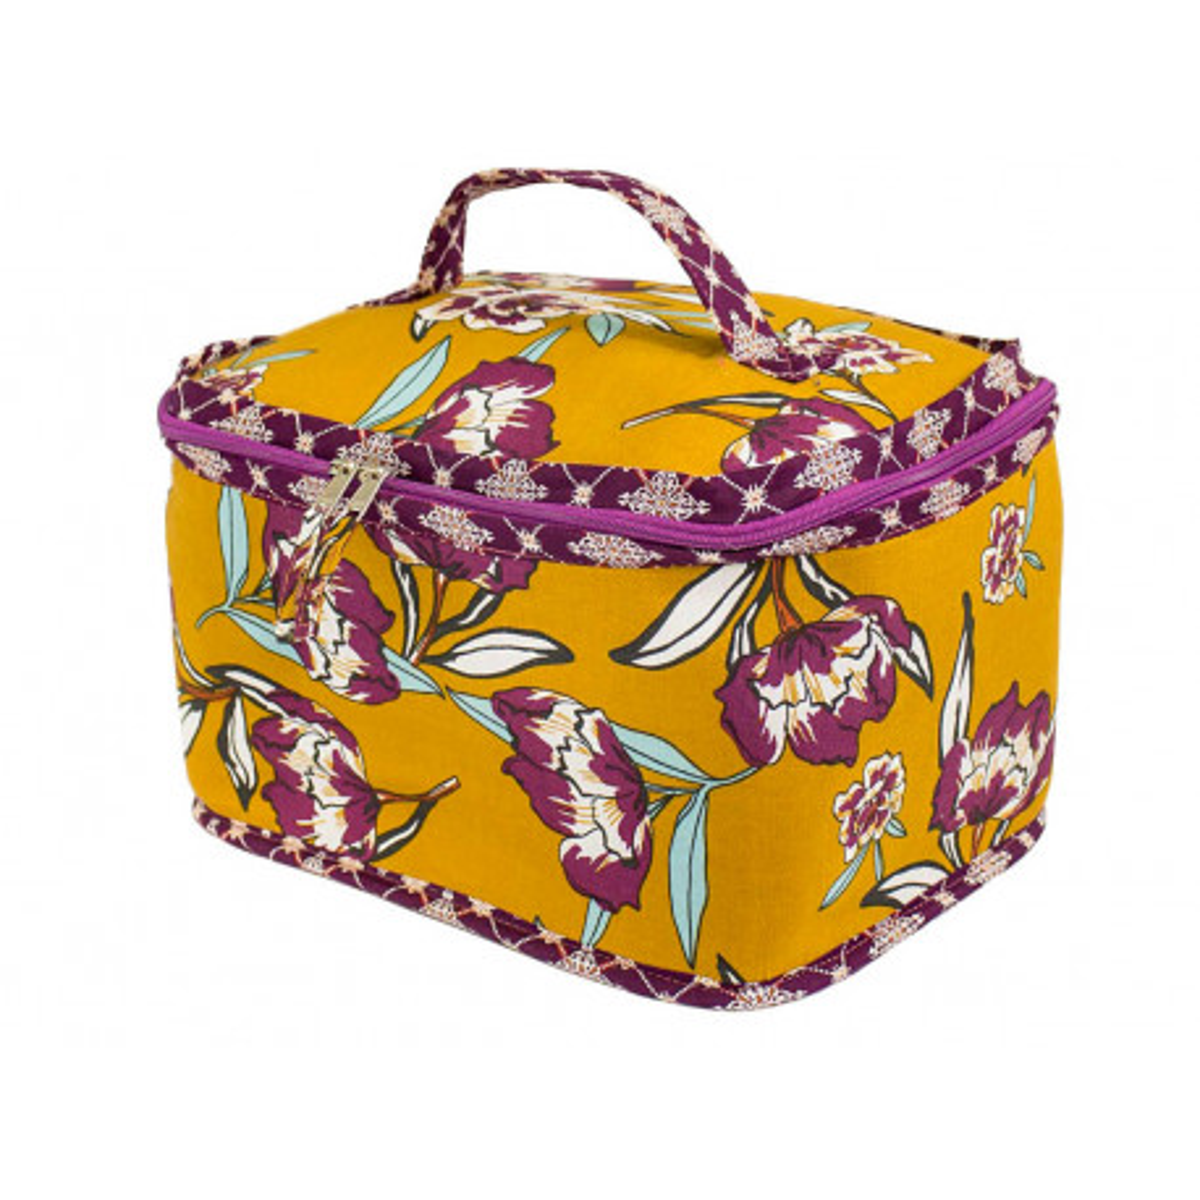 Grand vanity jaune moutarde et fleurs violet prune